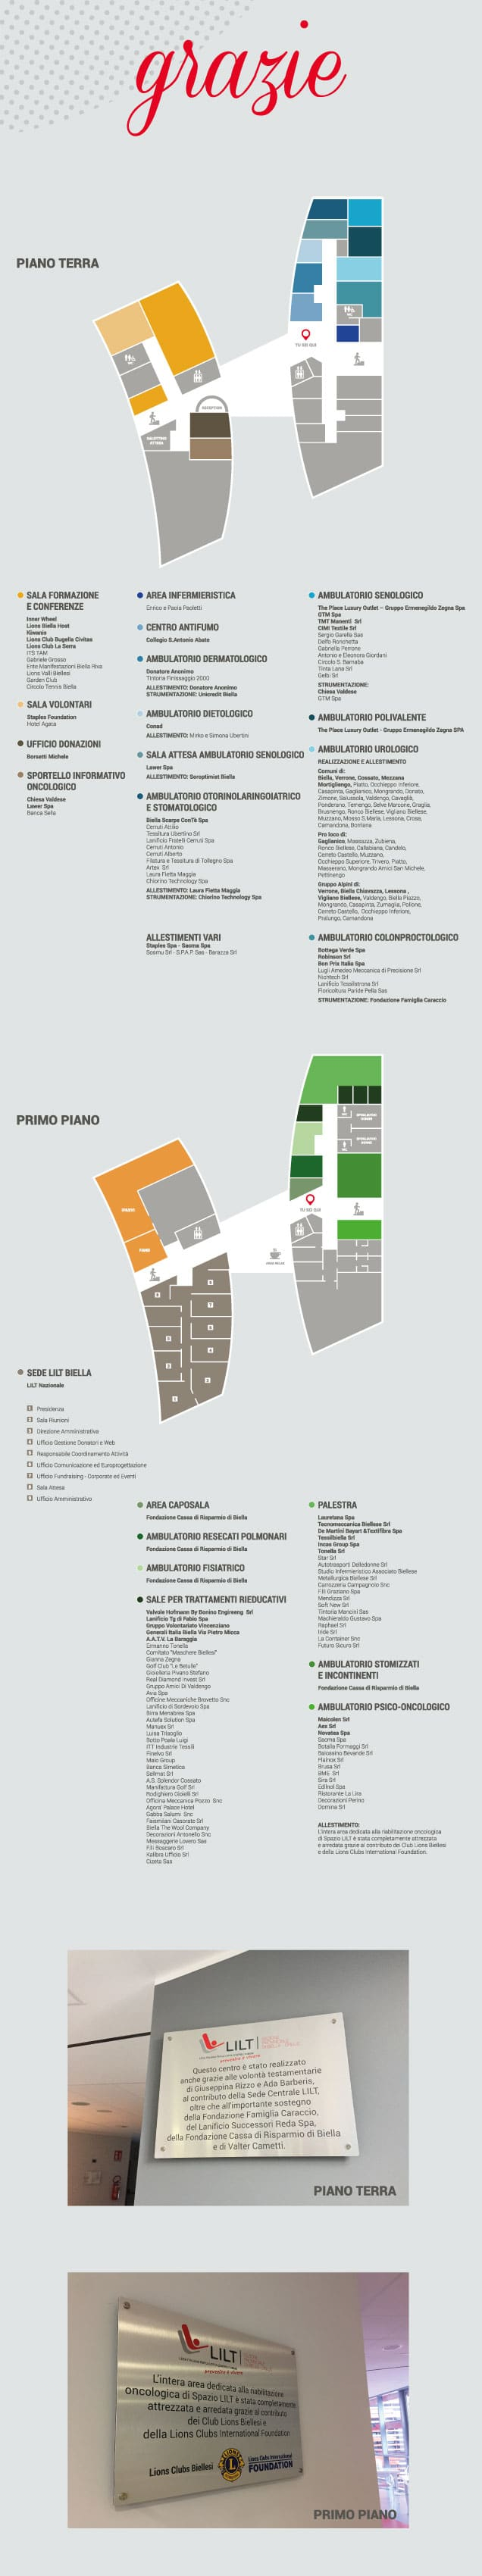 3-IMMAGINE-636X3500_DEM-Aziende-Spazio-Lilt